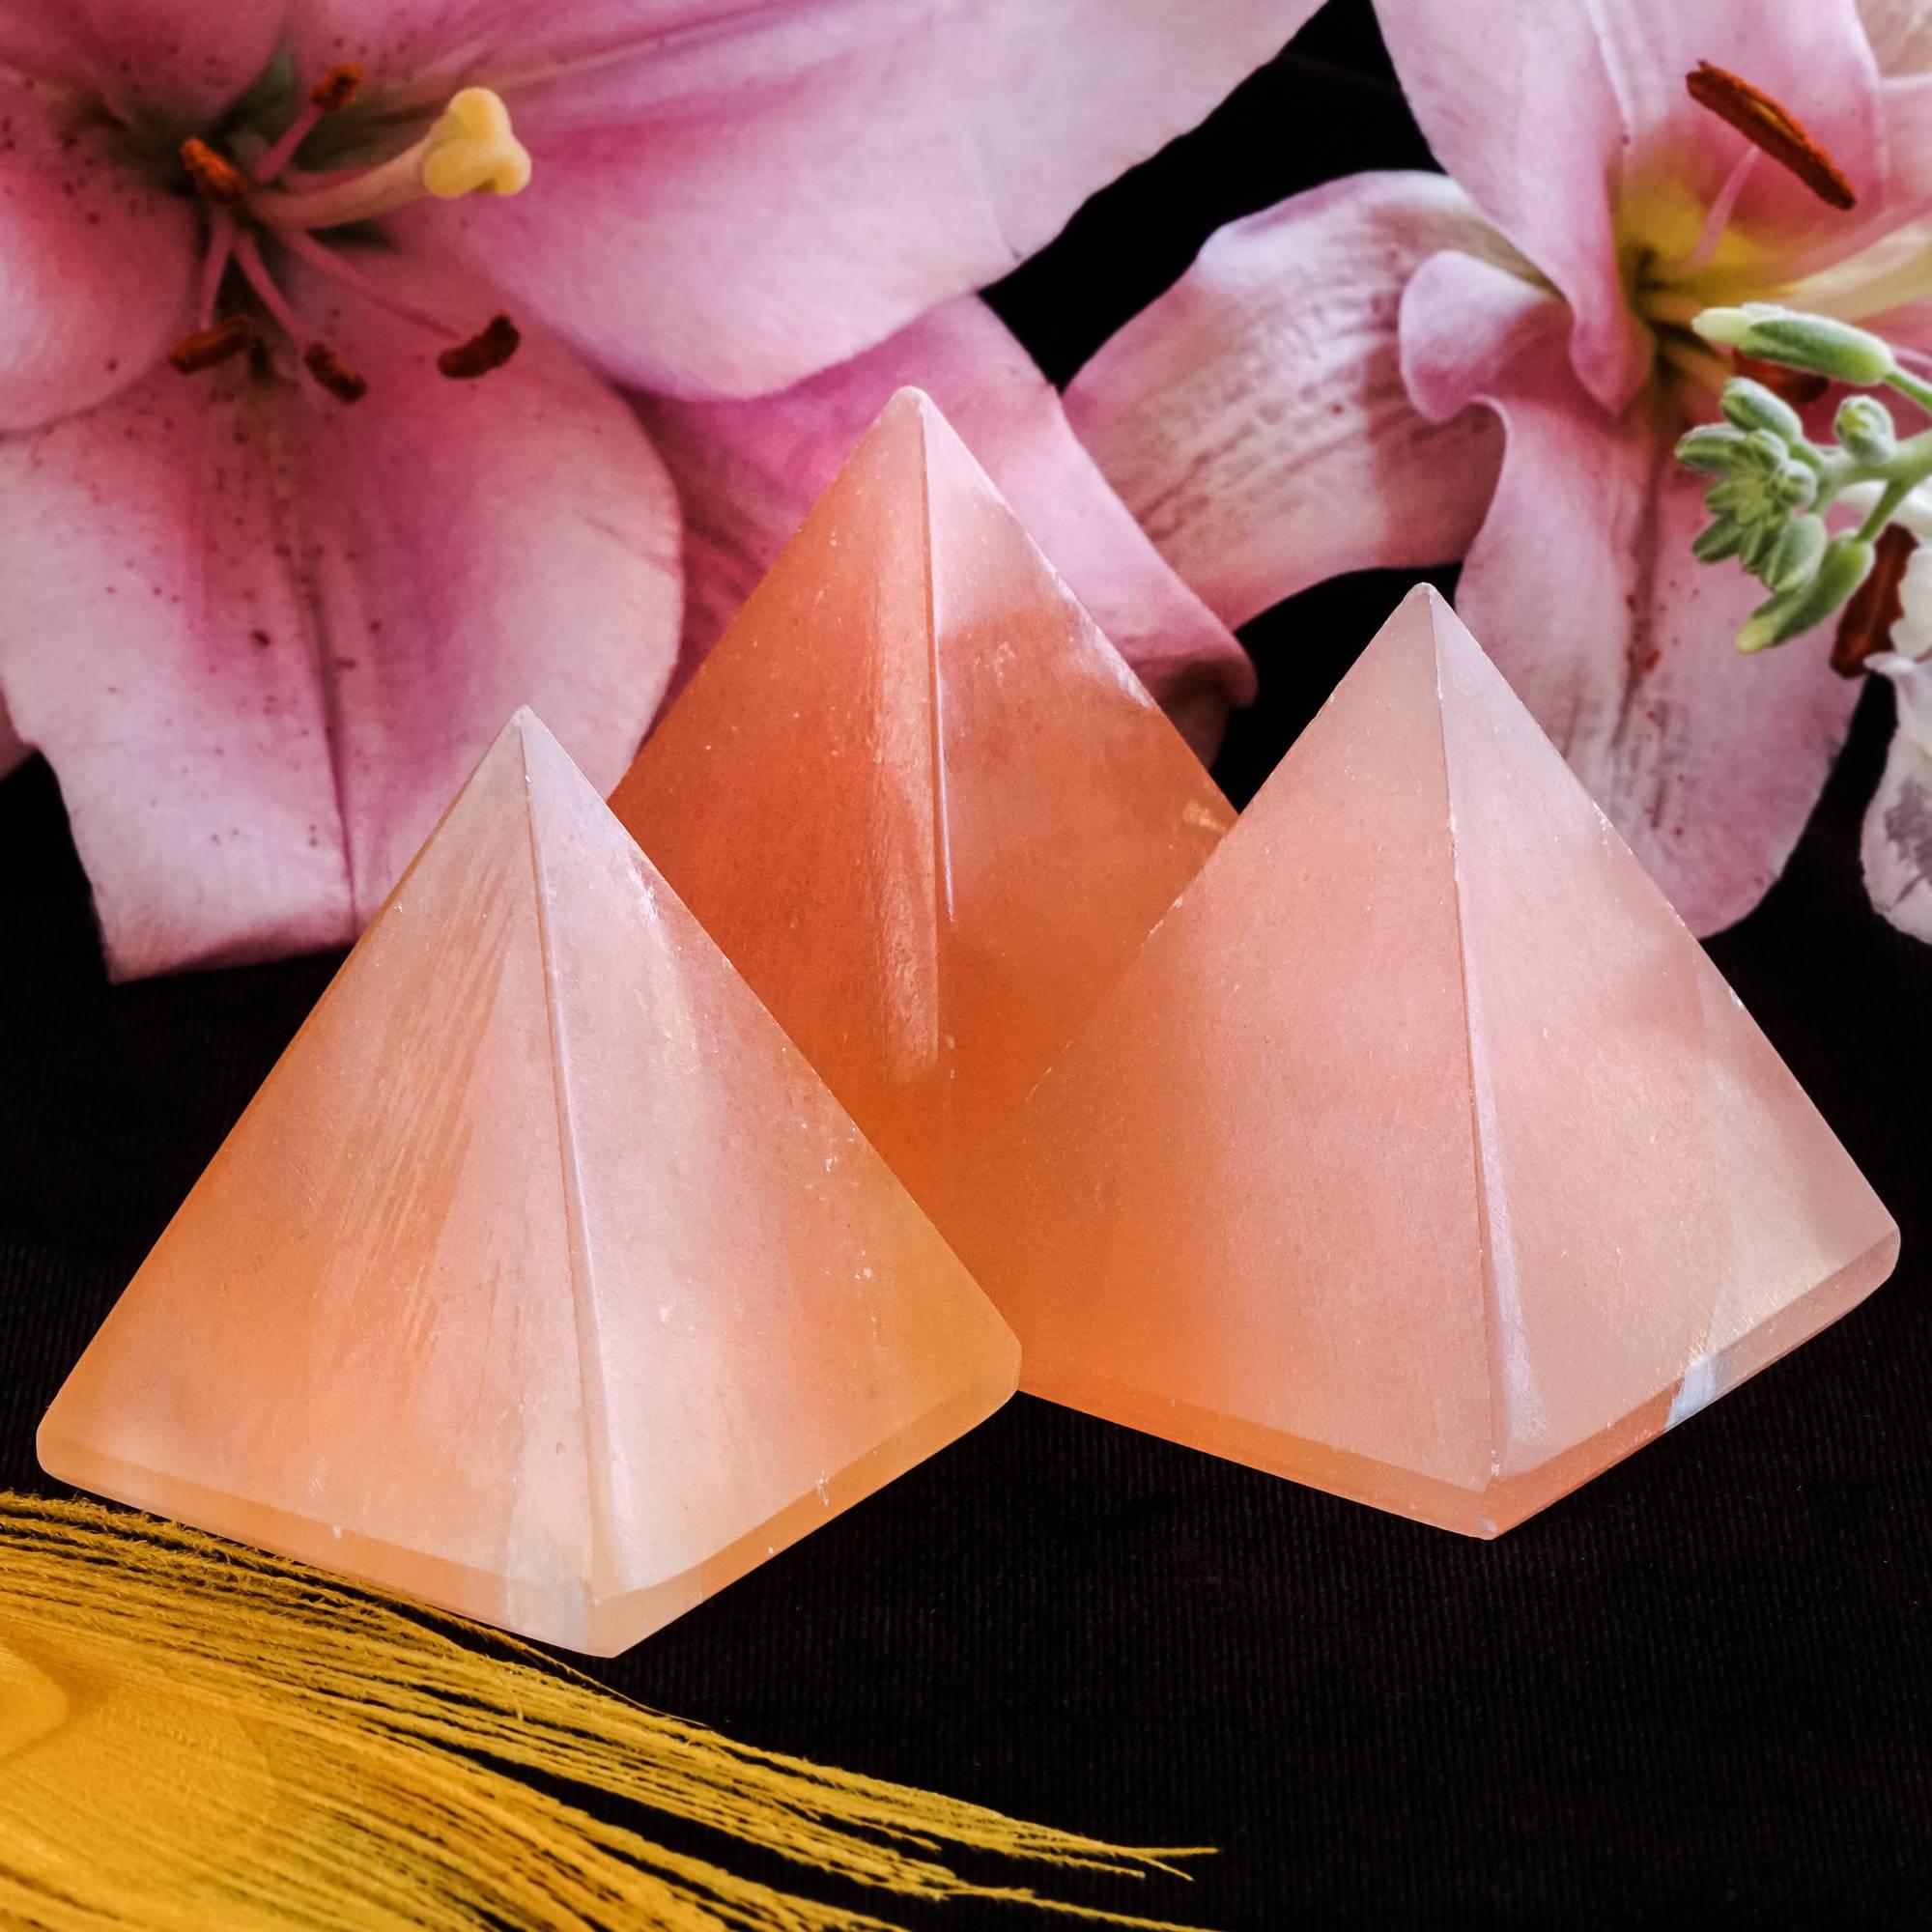 orange selenite pyramids